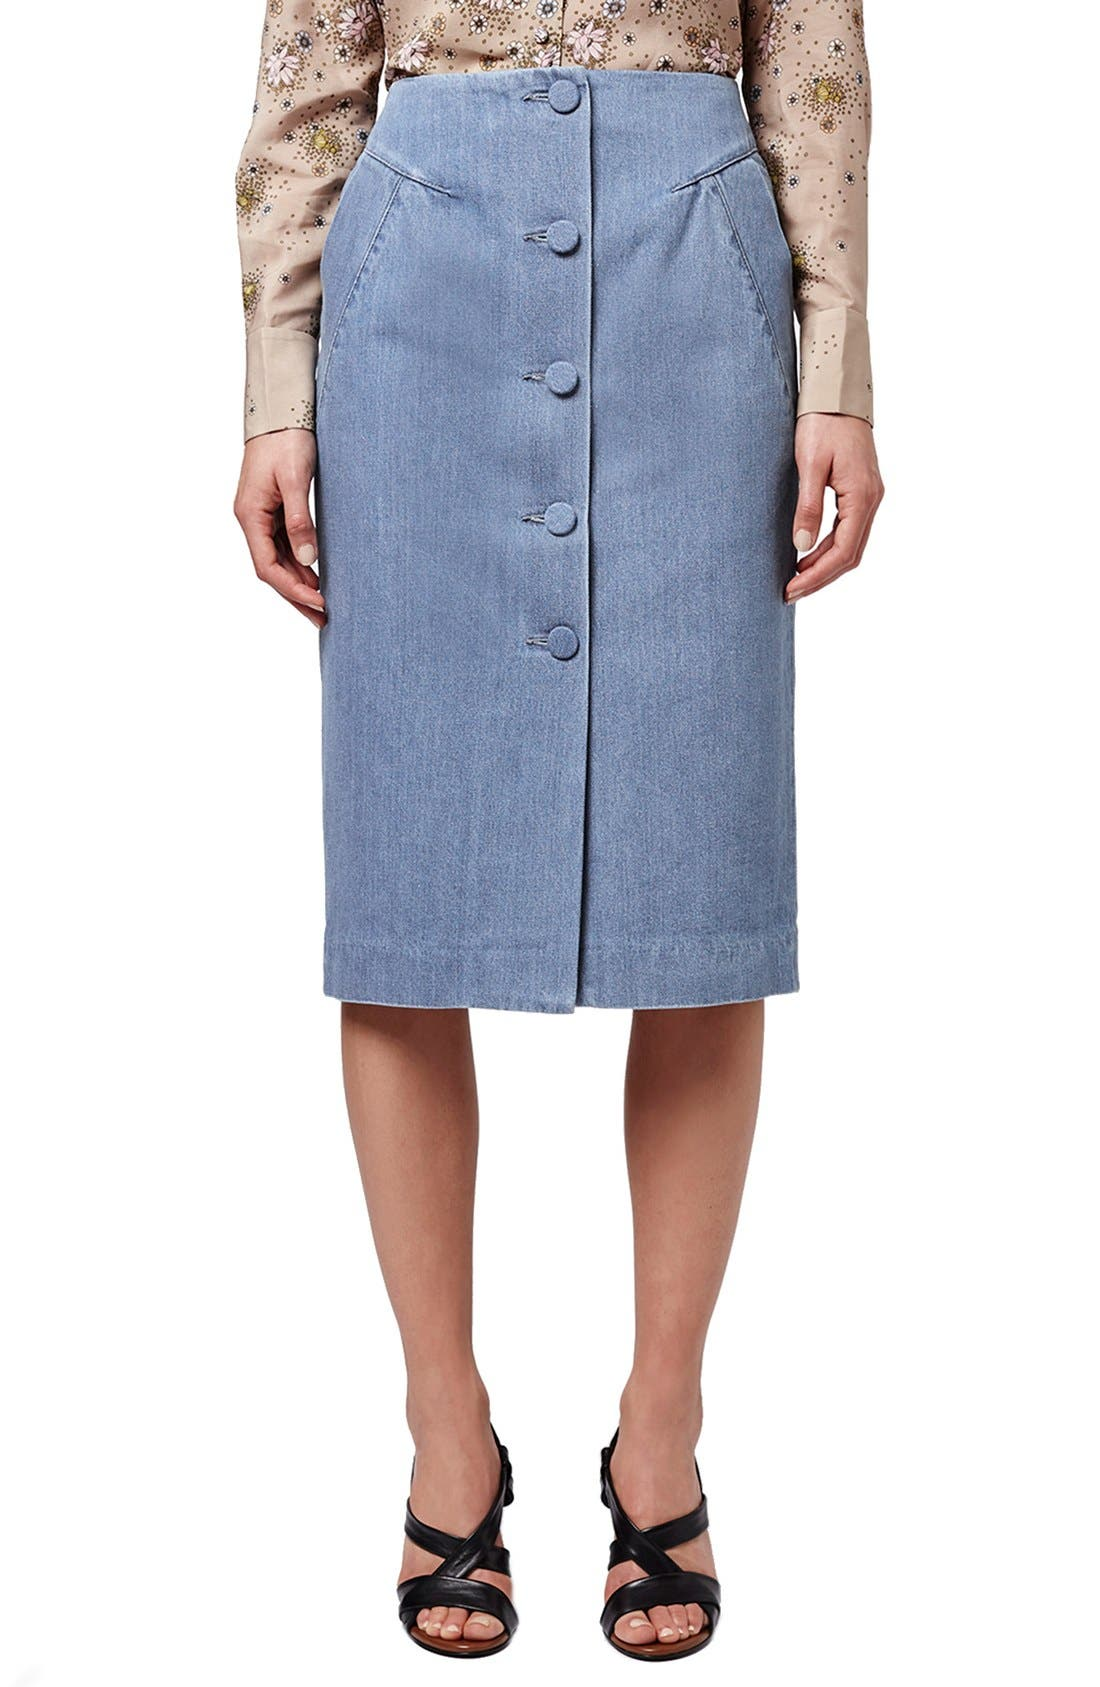 Alternate Image 1 Selected - Topshop Unique 'Whitcomb' Button Front Denim Midi Skirt